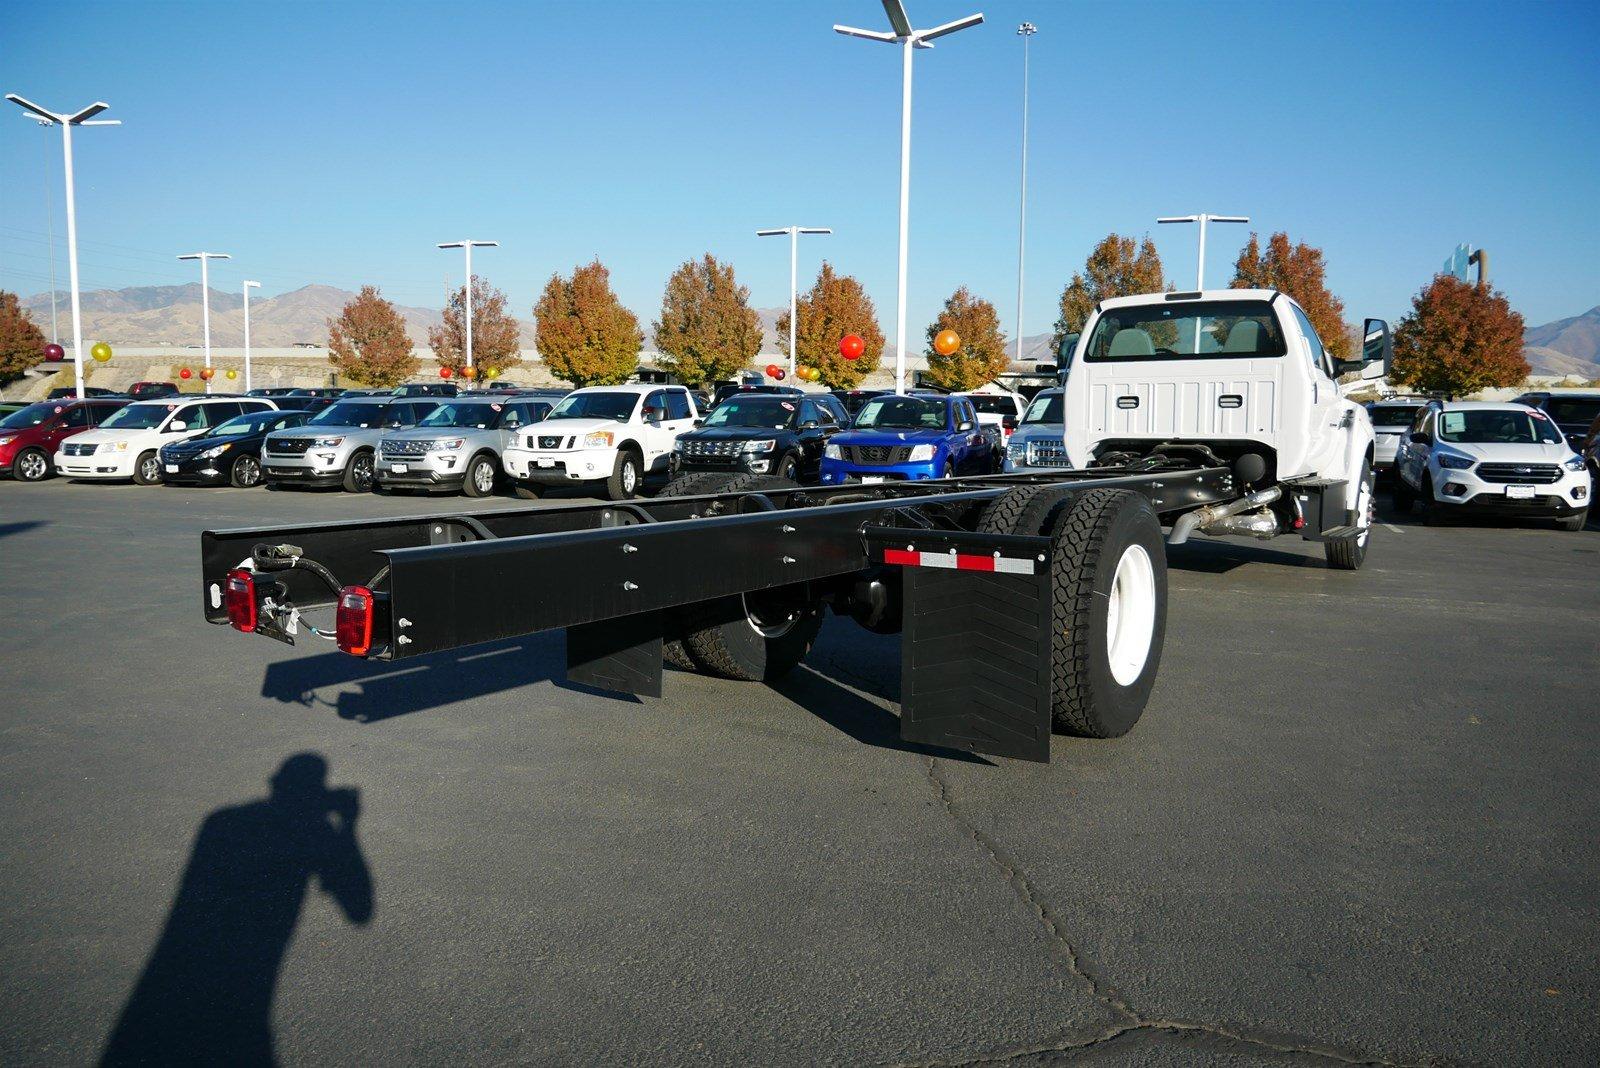 2018 F-650 Regular Cab DRW 4x2, Cab Chassis #68232 - photo 1